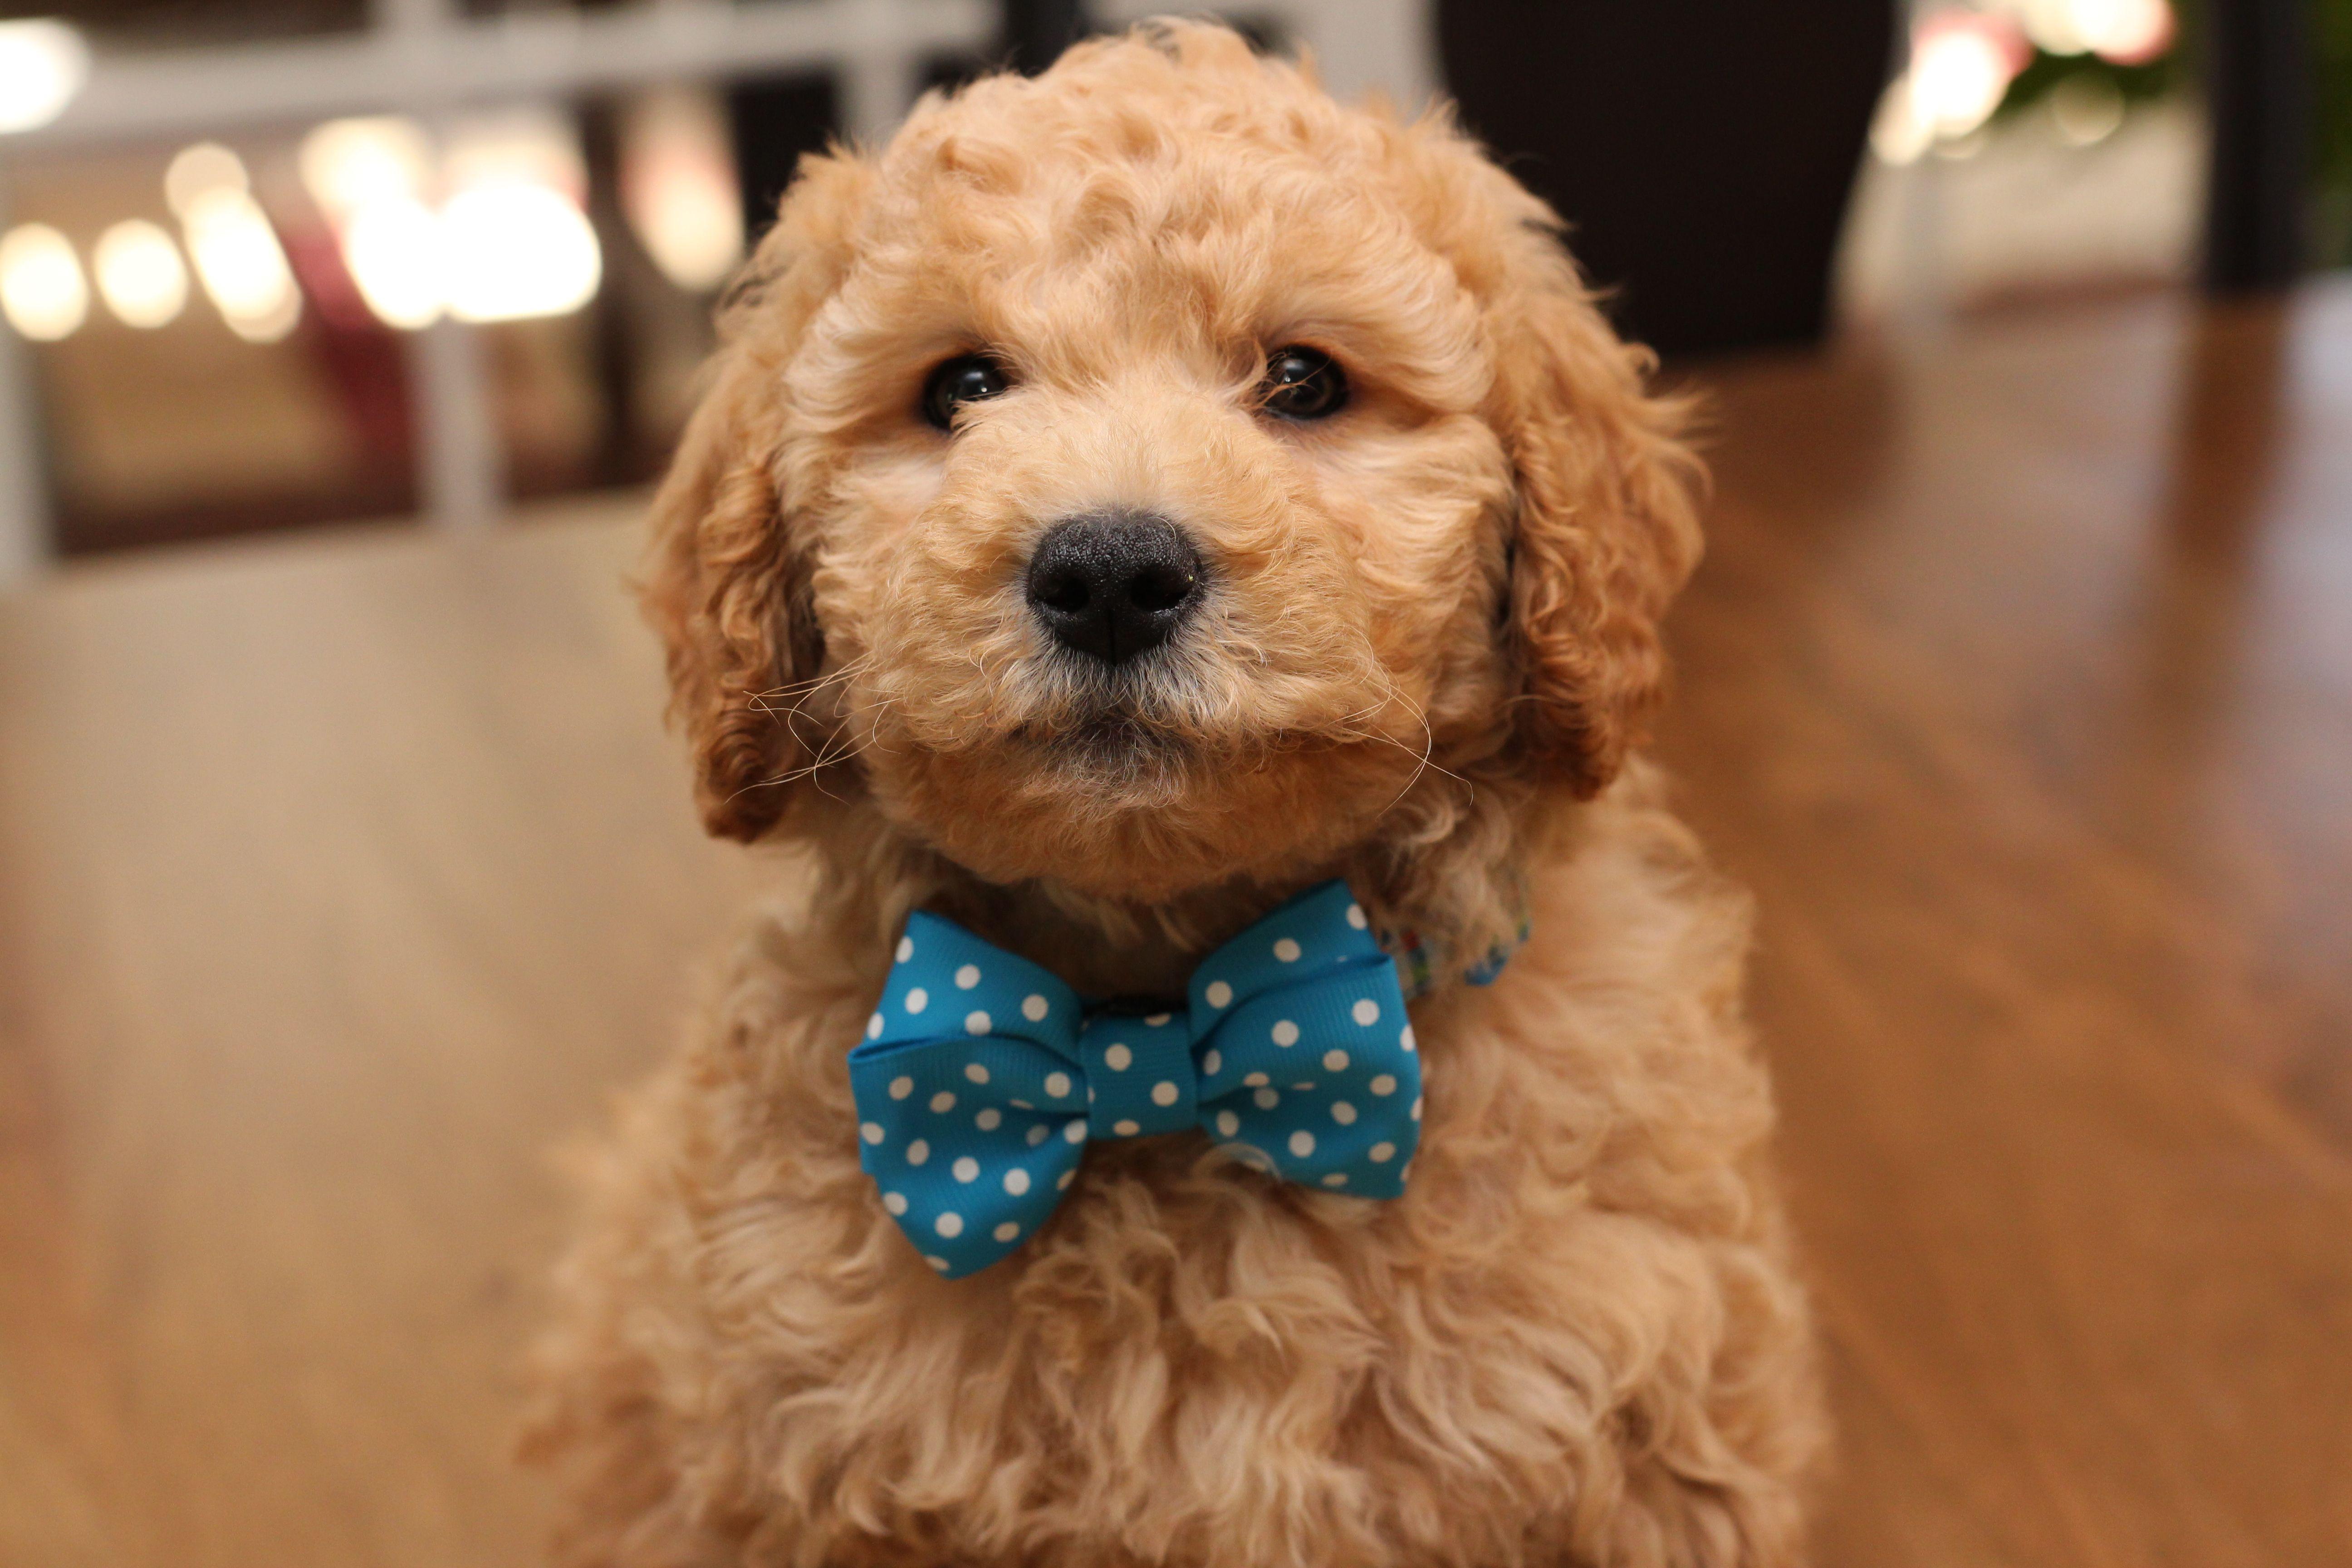 Mini Goldendoodle Puppy At 8 Weeks Old Orange Collar Boy River